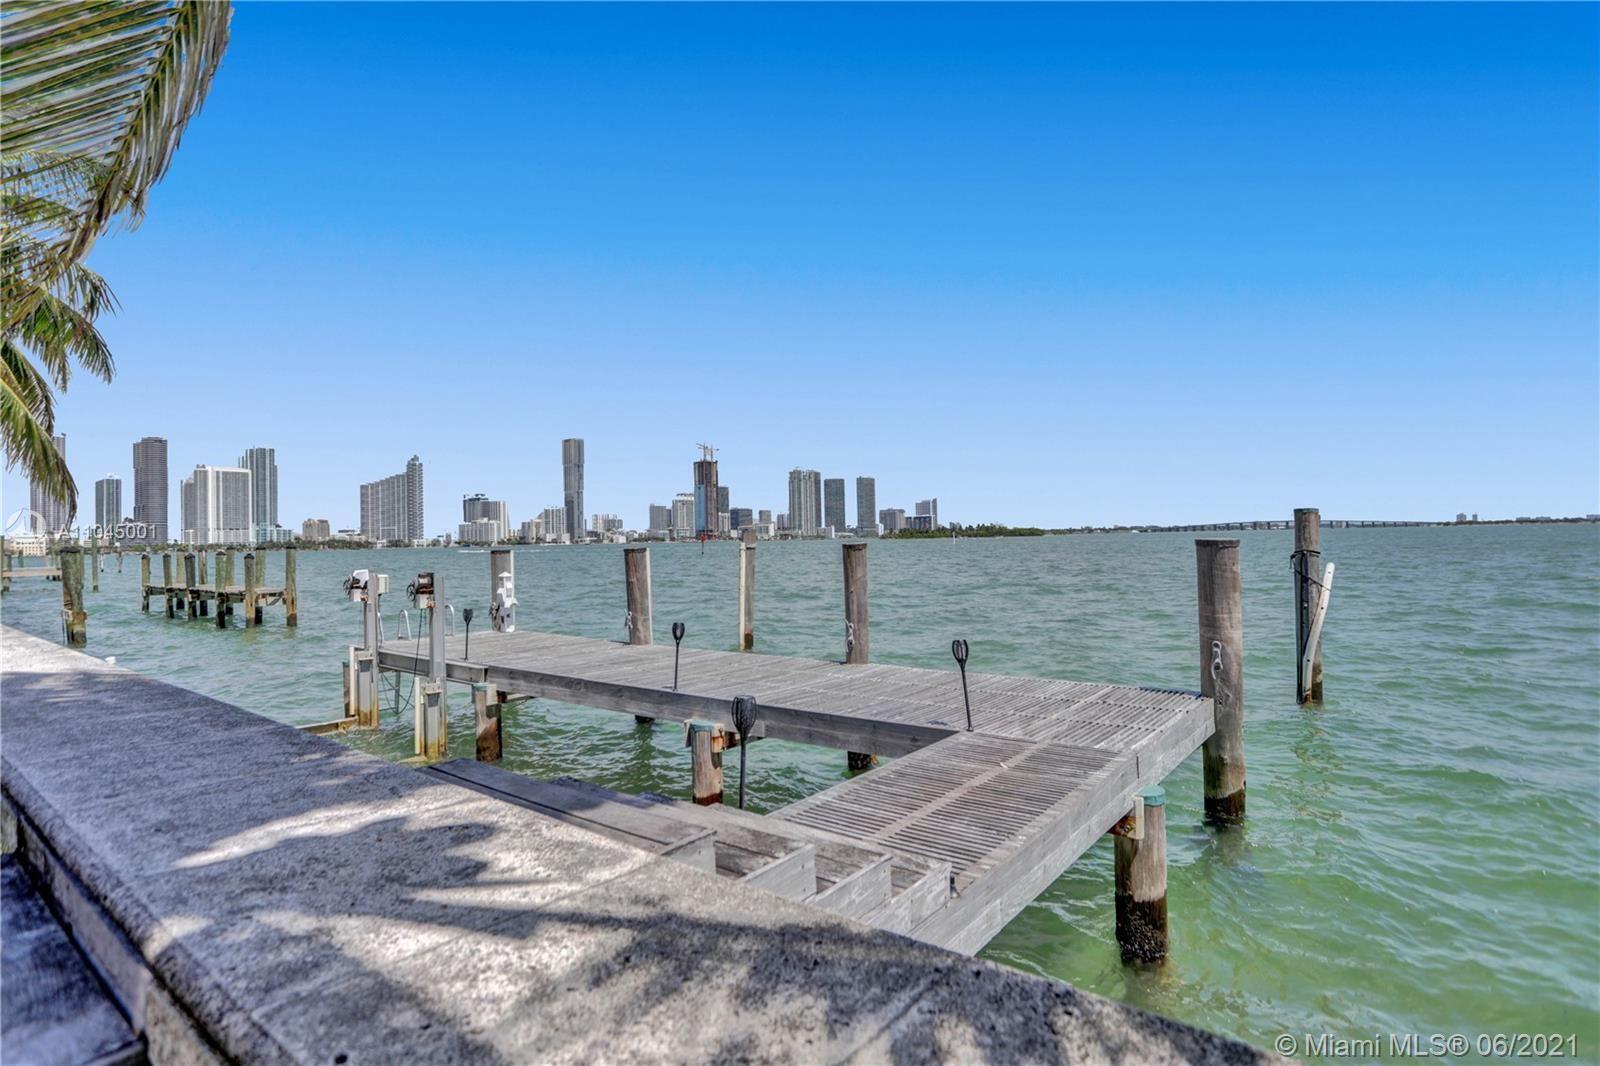 Photo of 1101 N Venetian Dr, Miami, FL 33139 (MLS # A11045001)